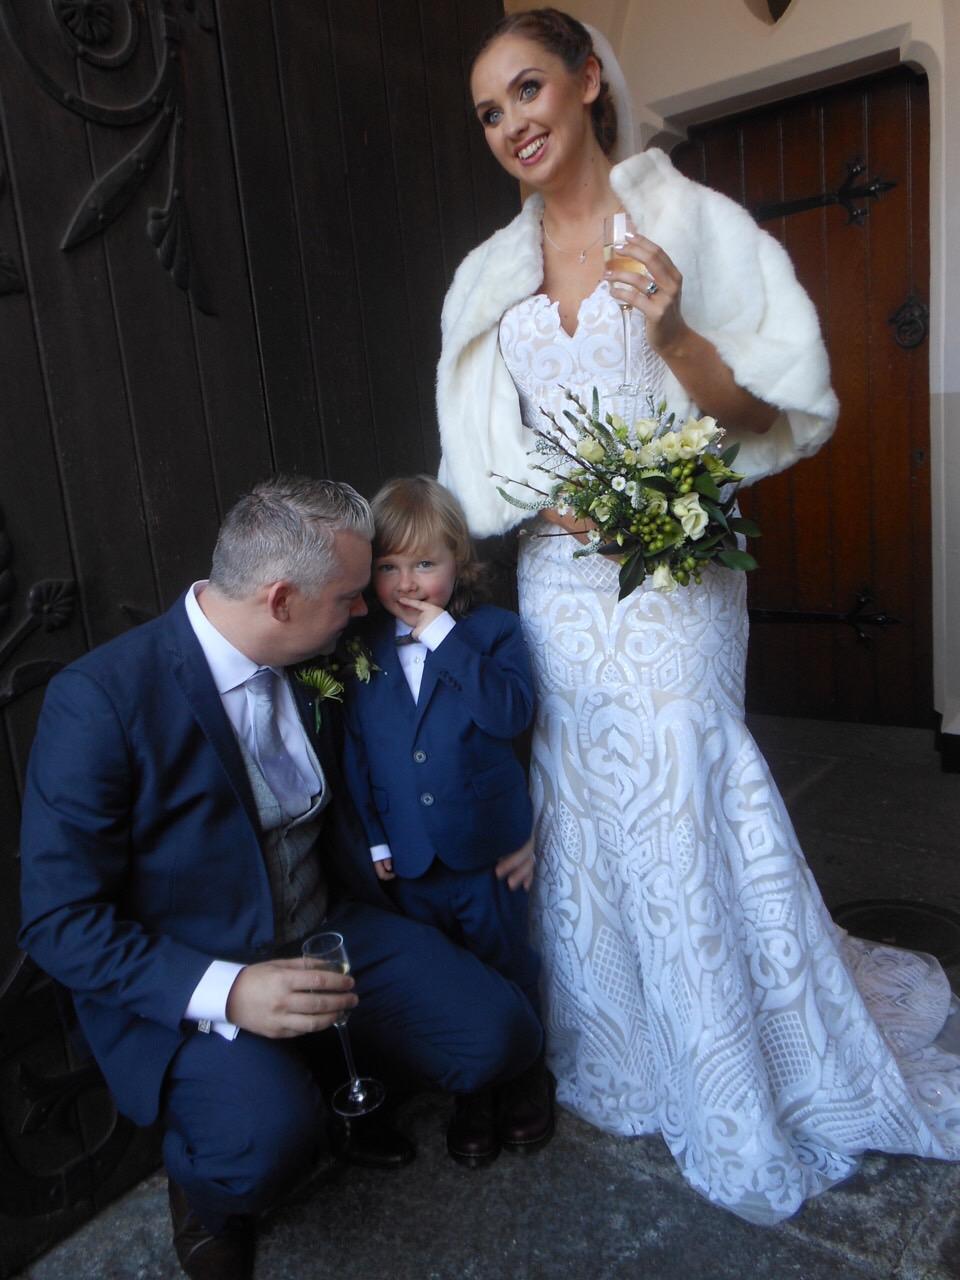 Dublin wedding | The Flourishing Pantry.JPG